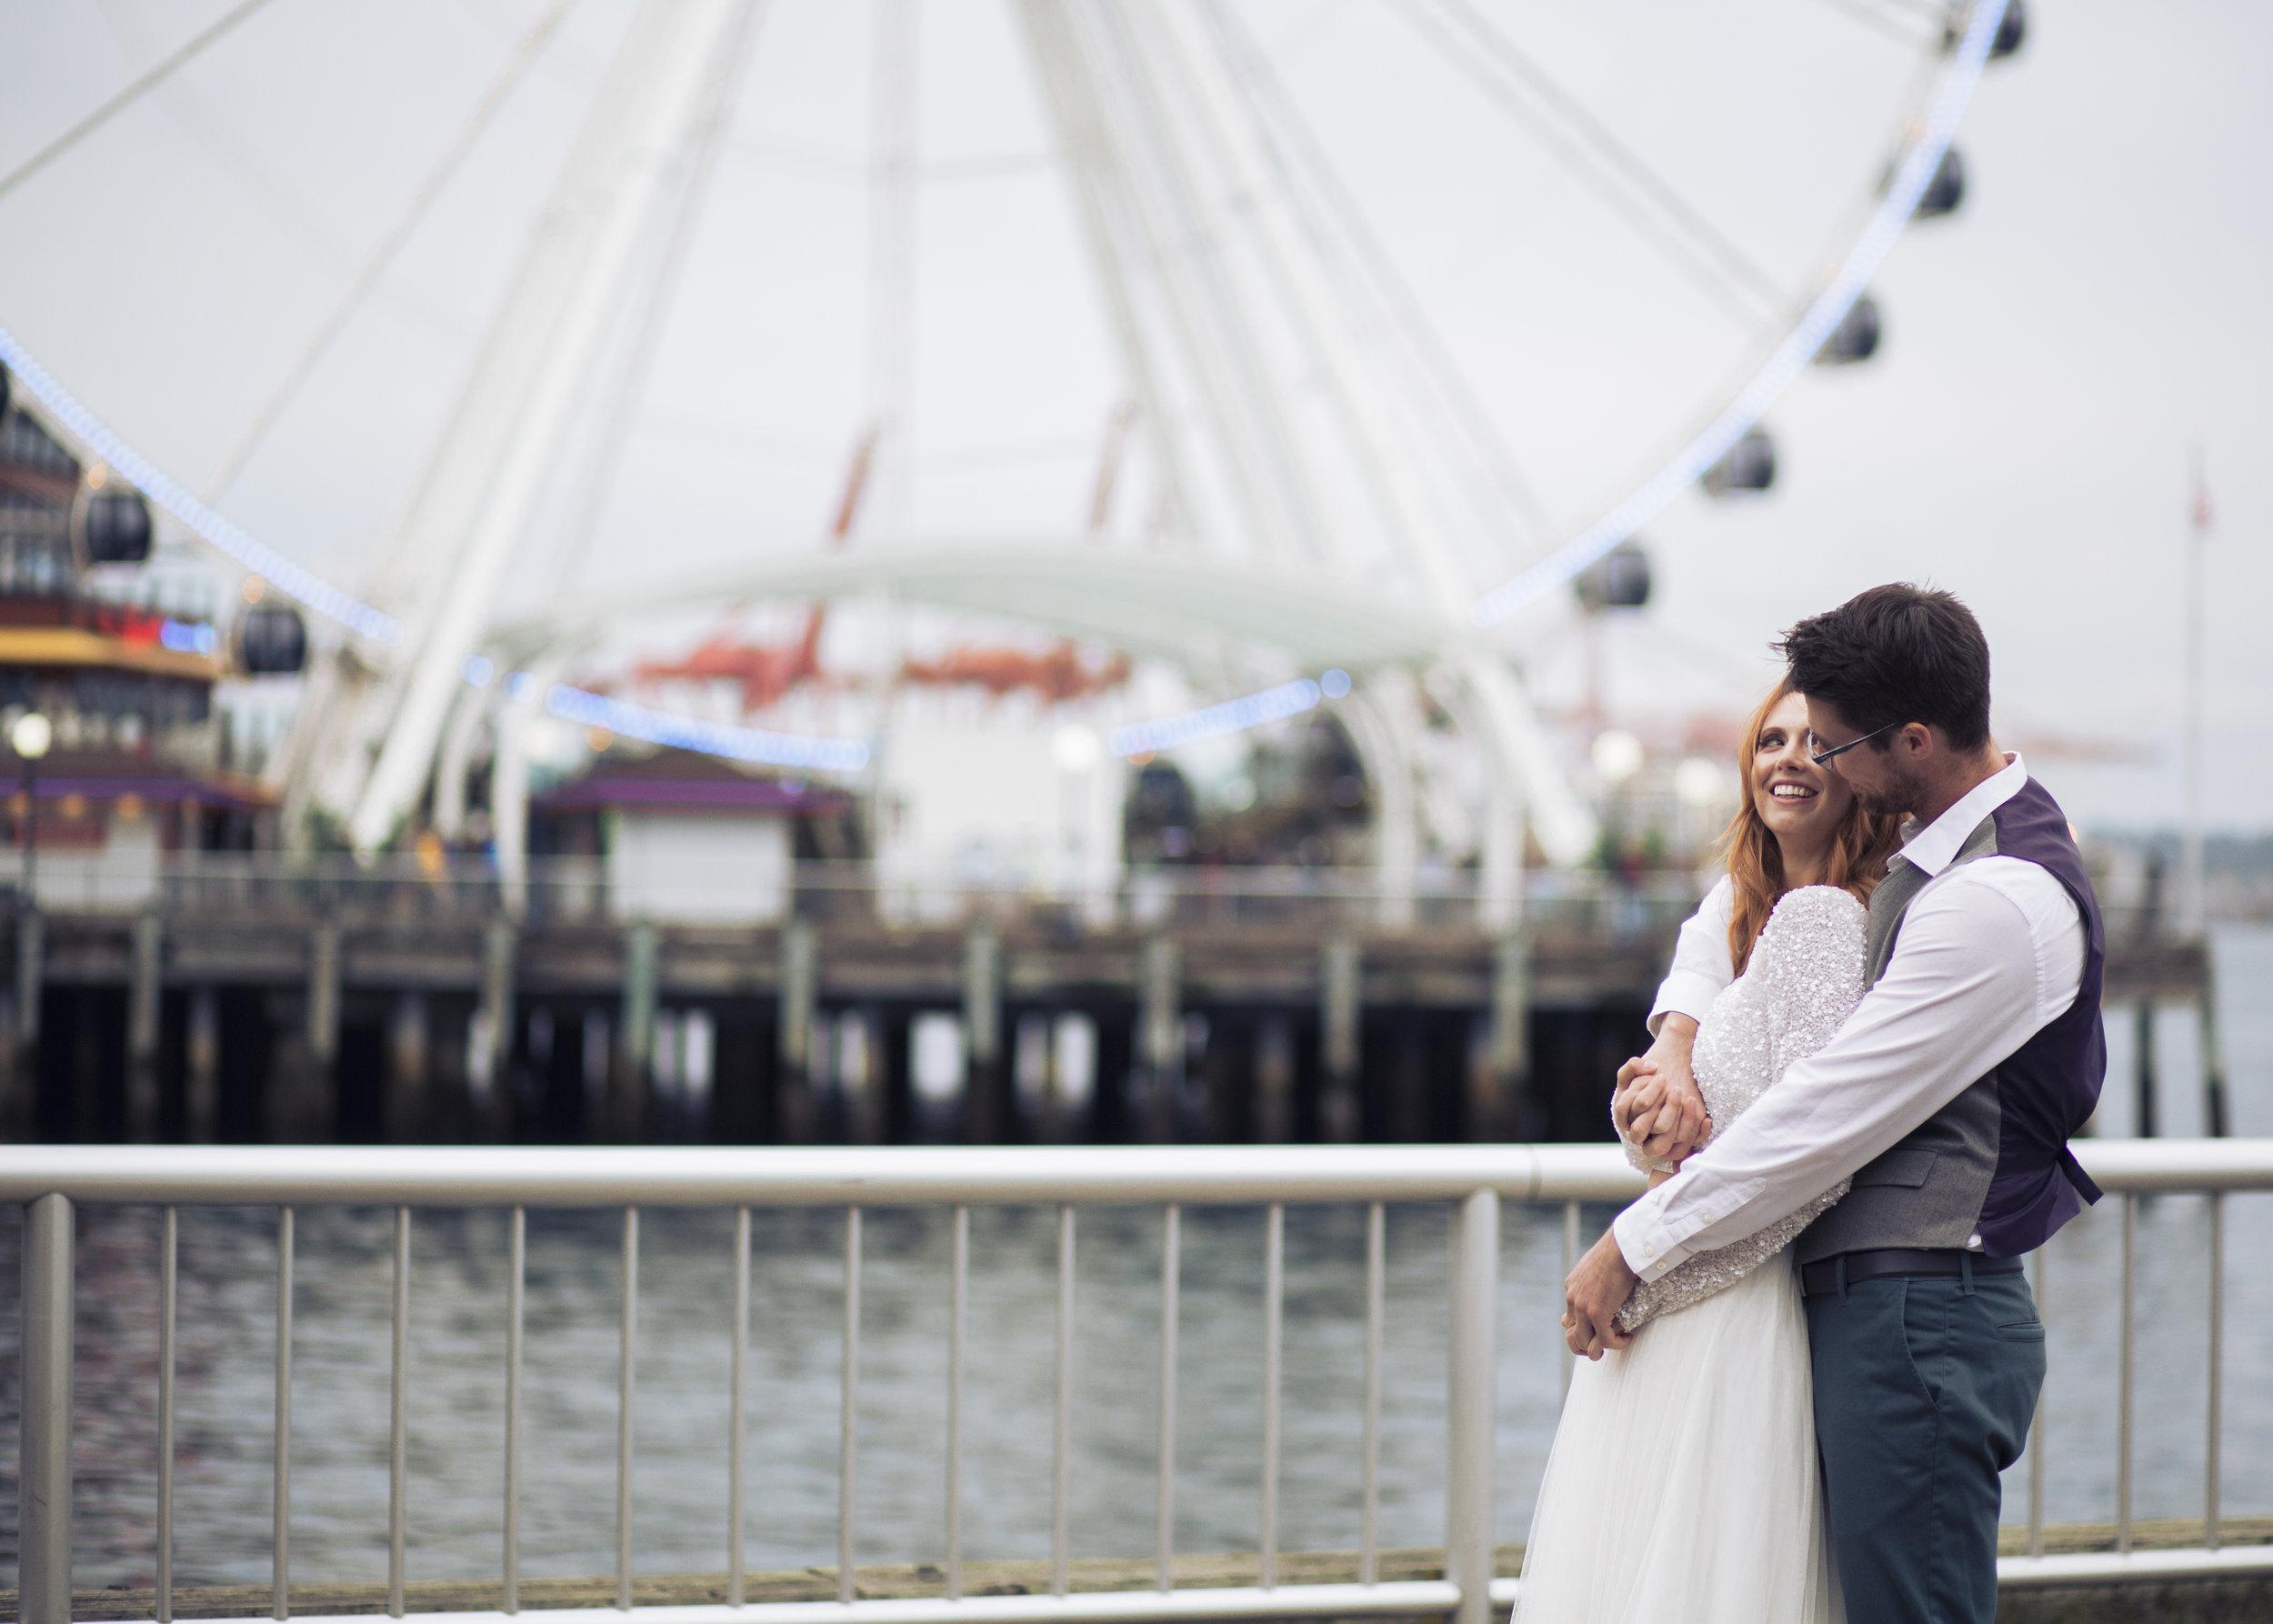 San Francisco Bay Area Wedding Family Photographer 0011.JPG